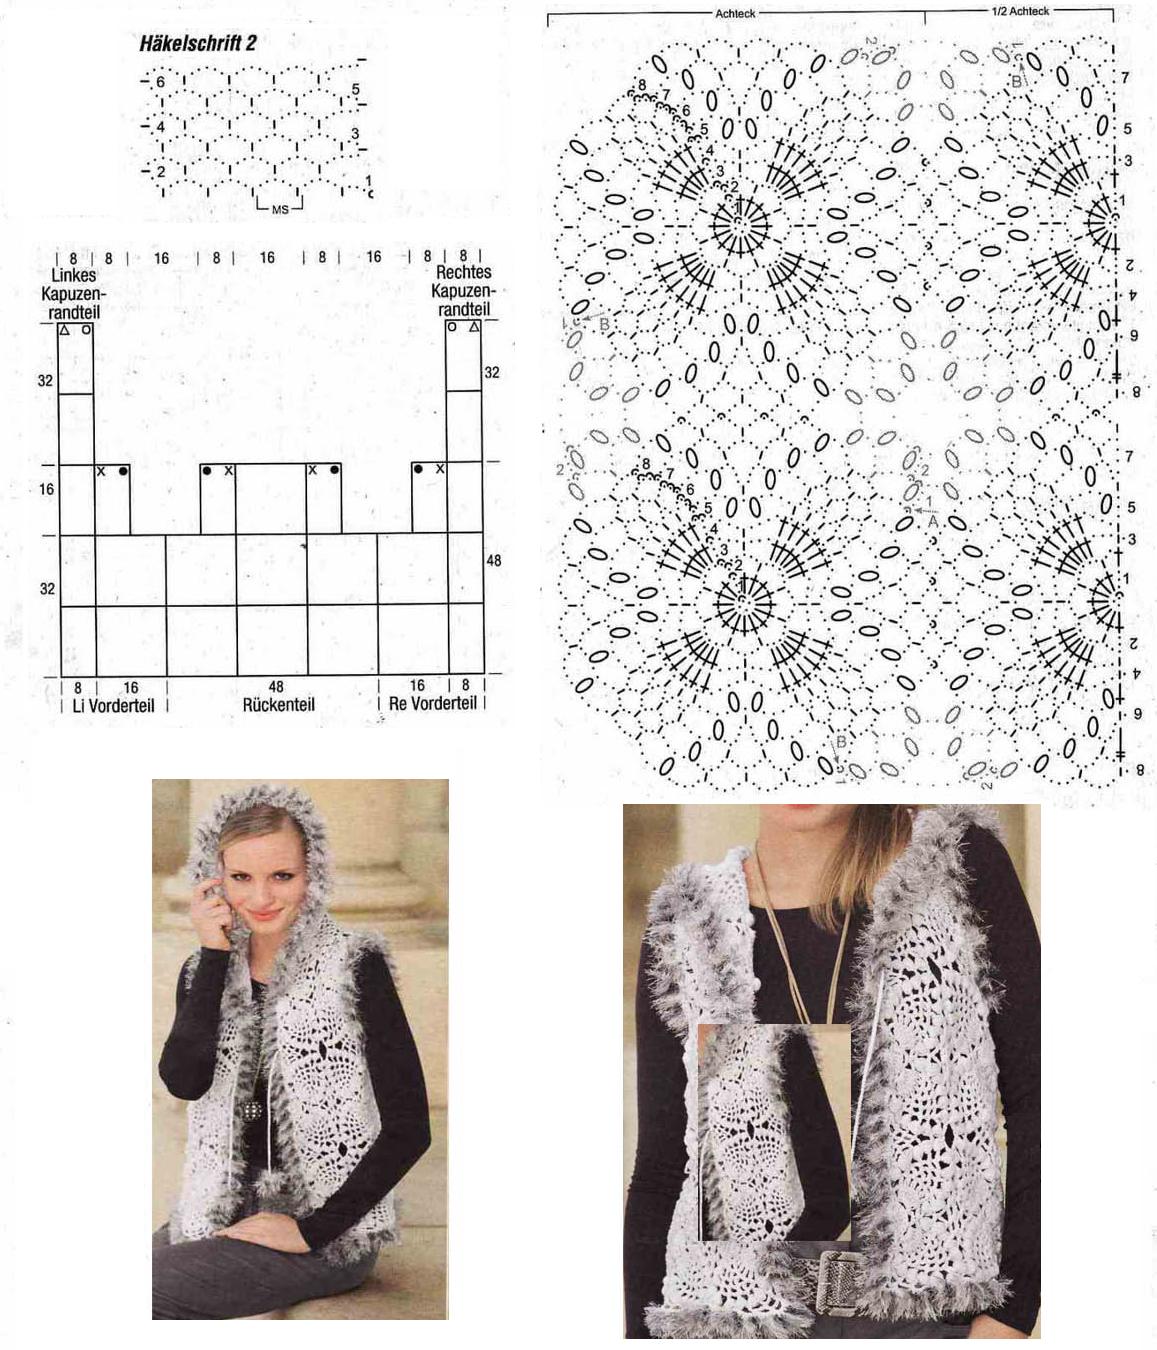 patrones chaleco crochet mujer - Buscar con Google | crochet ...